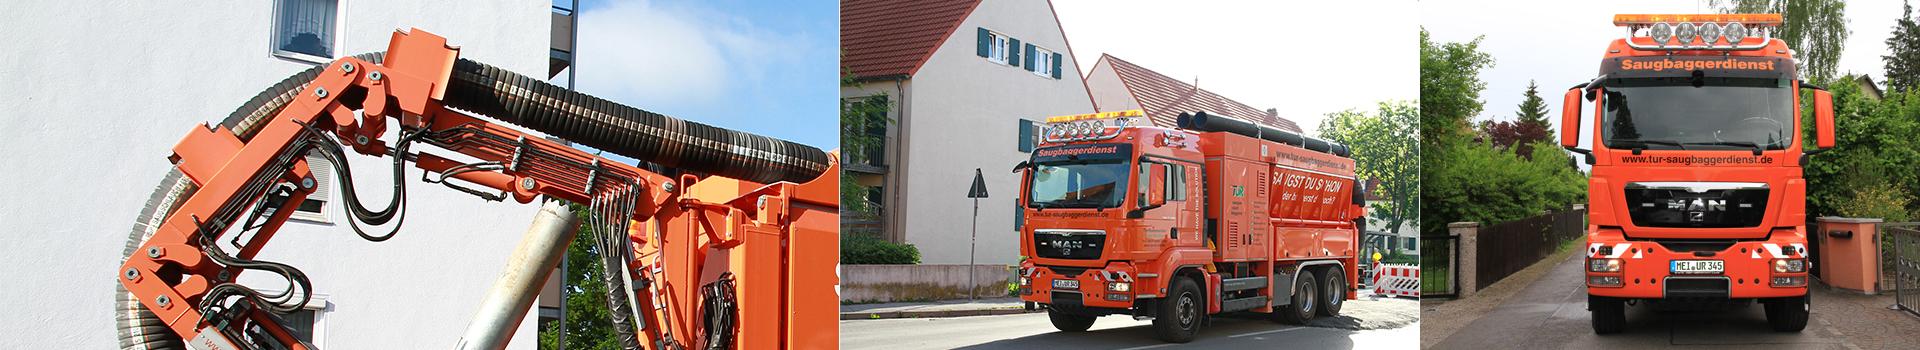 TUR Saugbaggerdienst GmbH